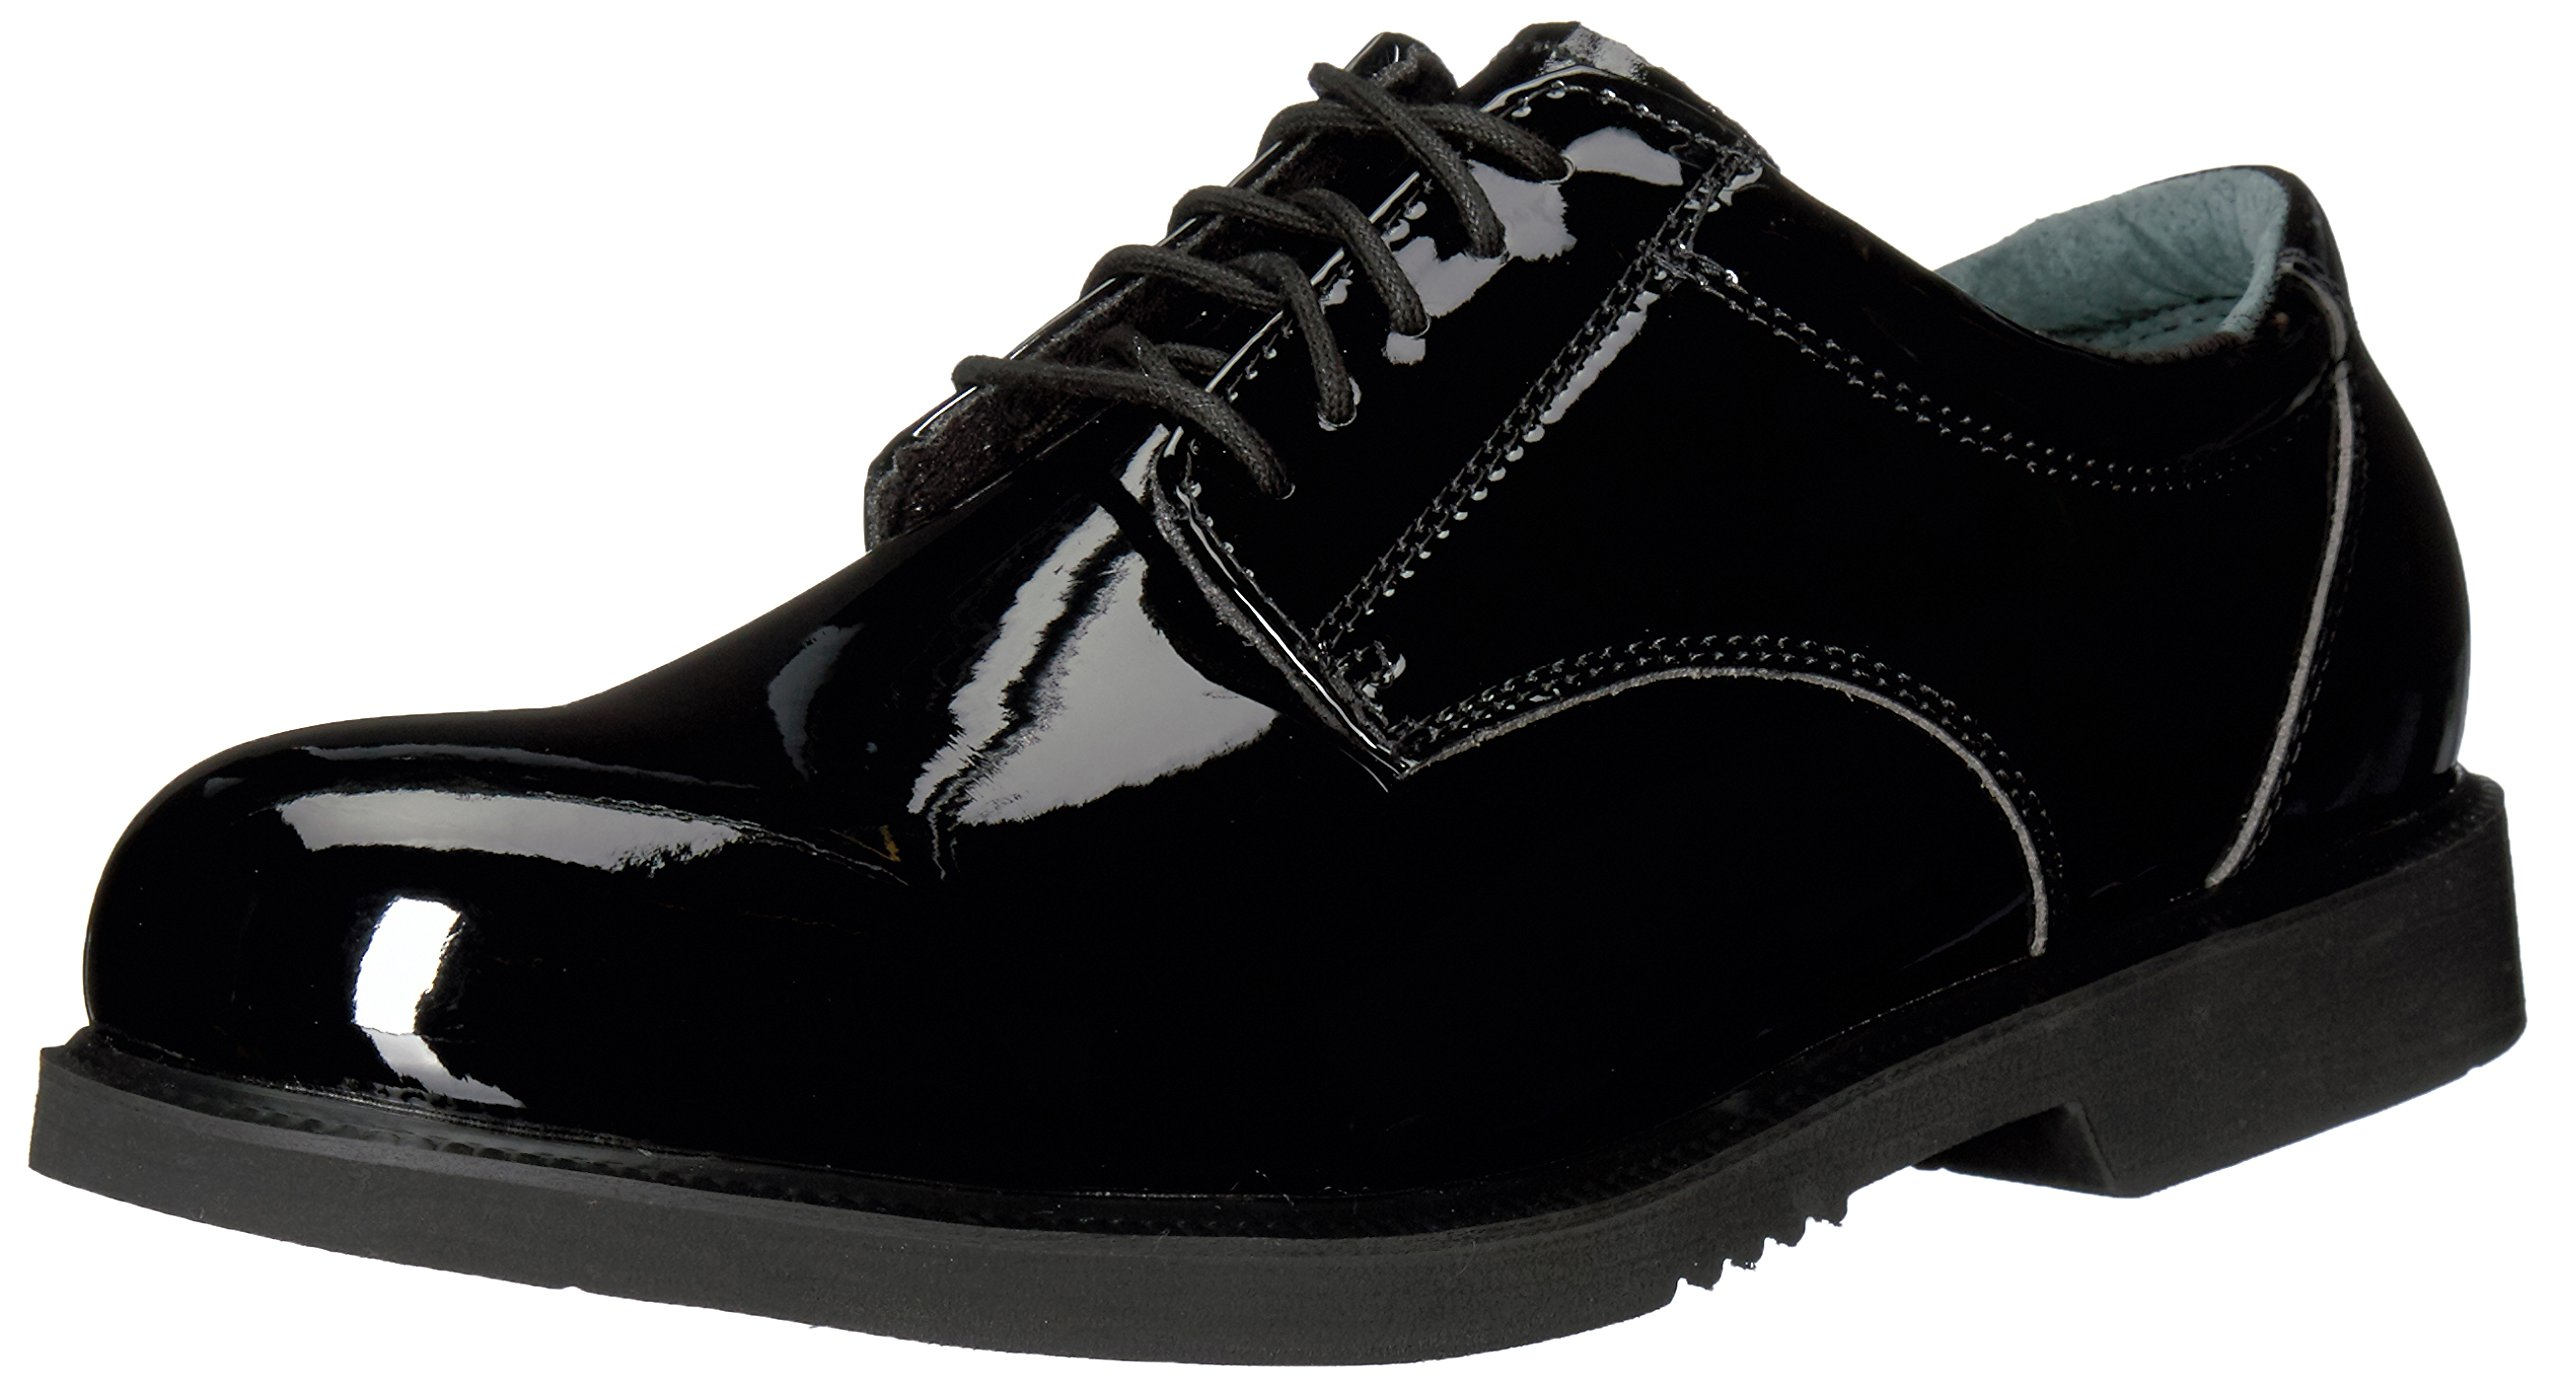 Thorogood 831-6031 Men's Uniform Classics - Poromeric Oxford Shoe, Black - 11 D(M) US by Thorogood